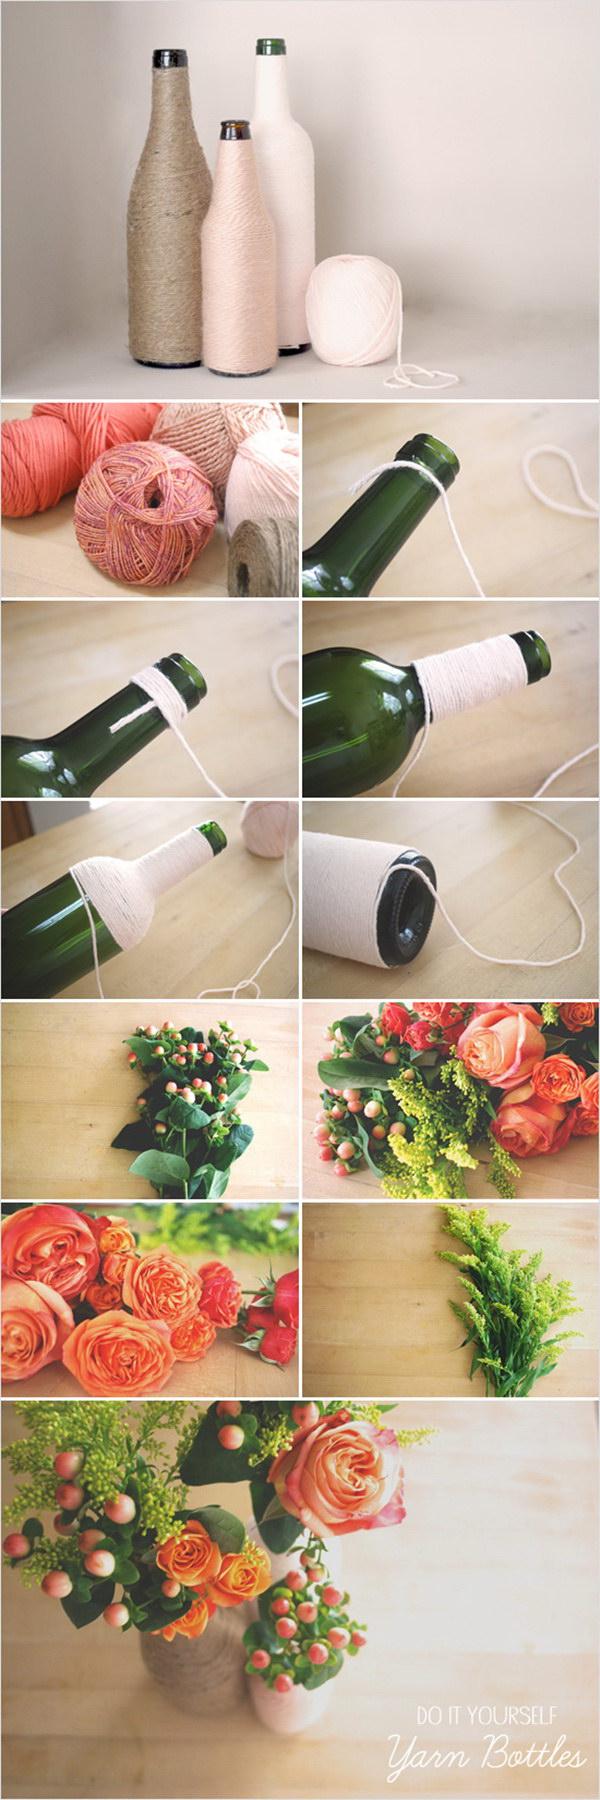 DIY Yarn Wrapped Bottles.